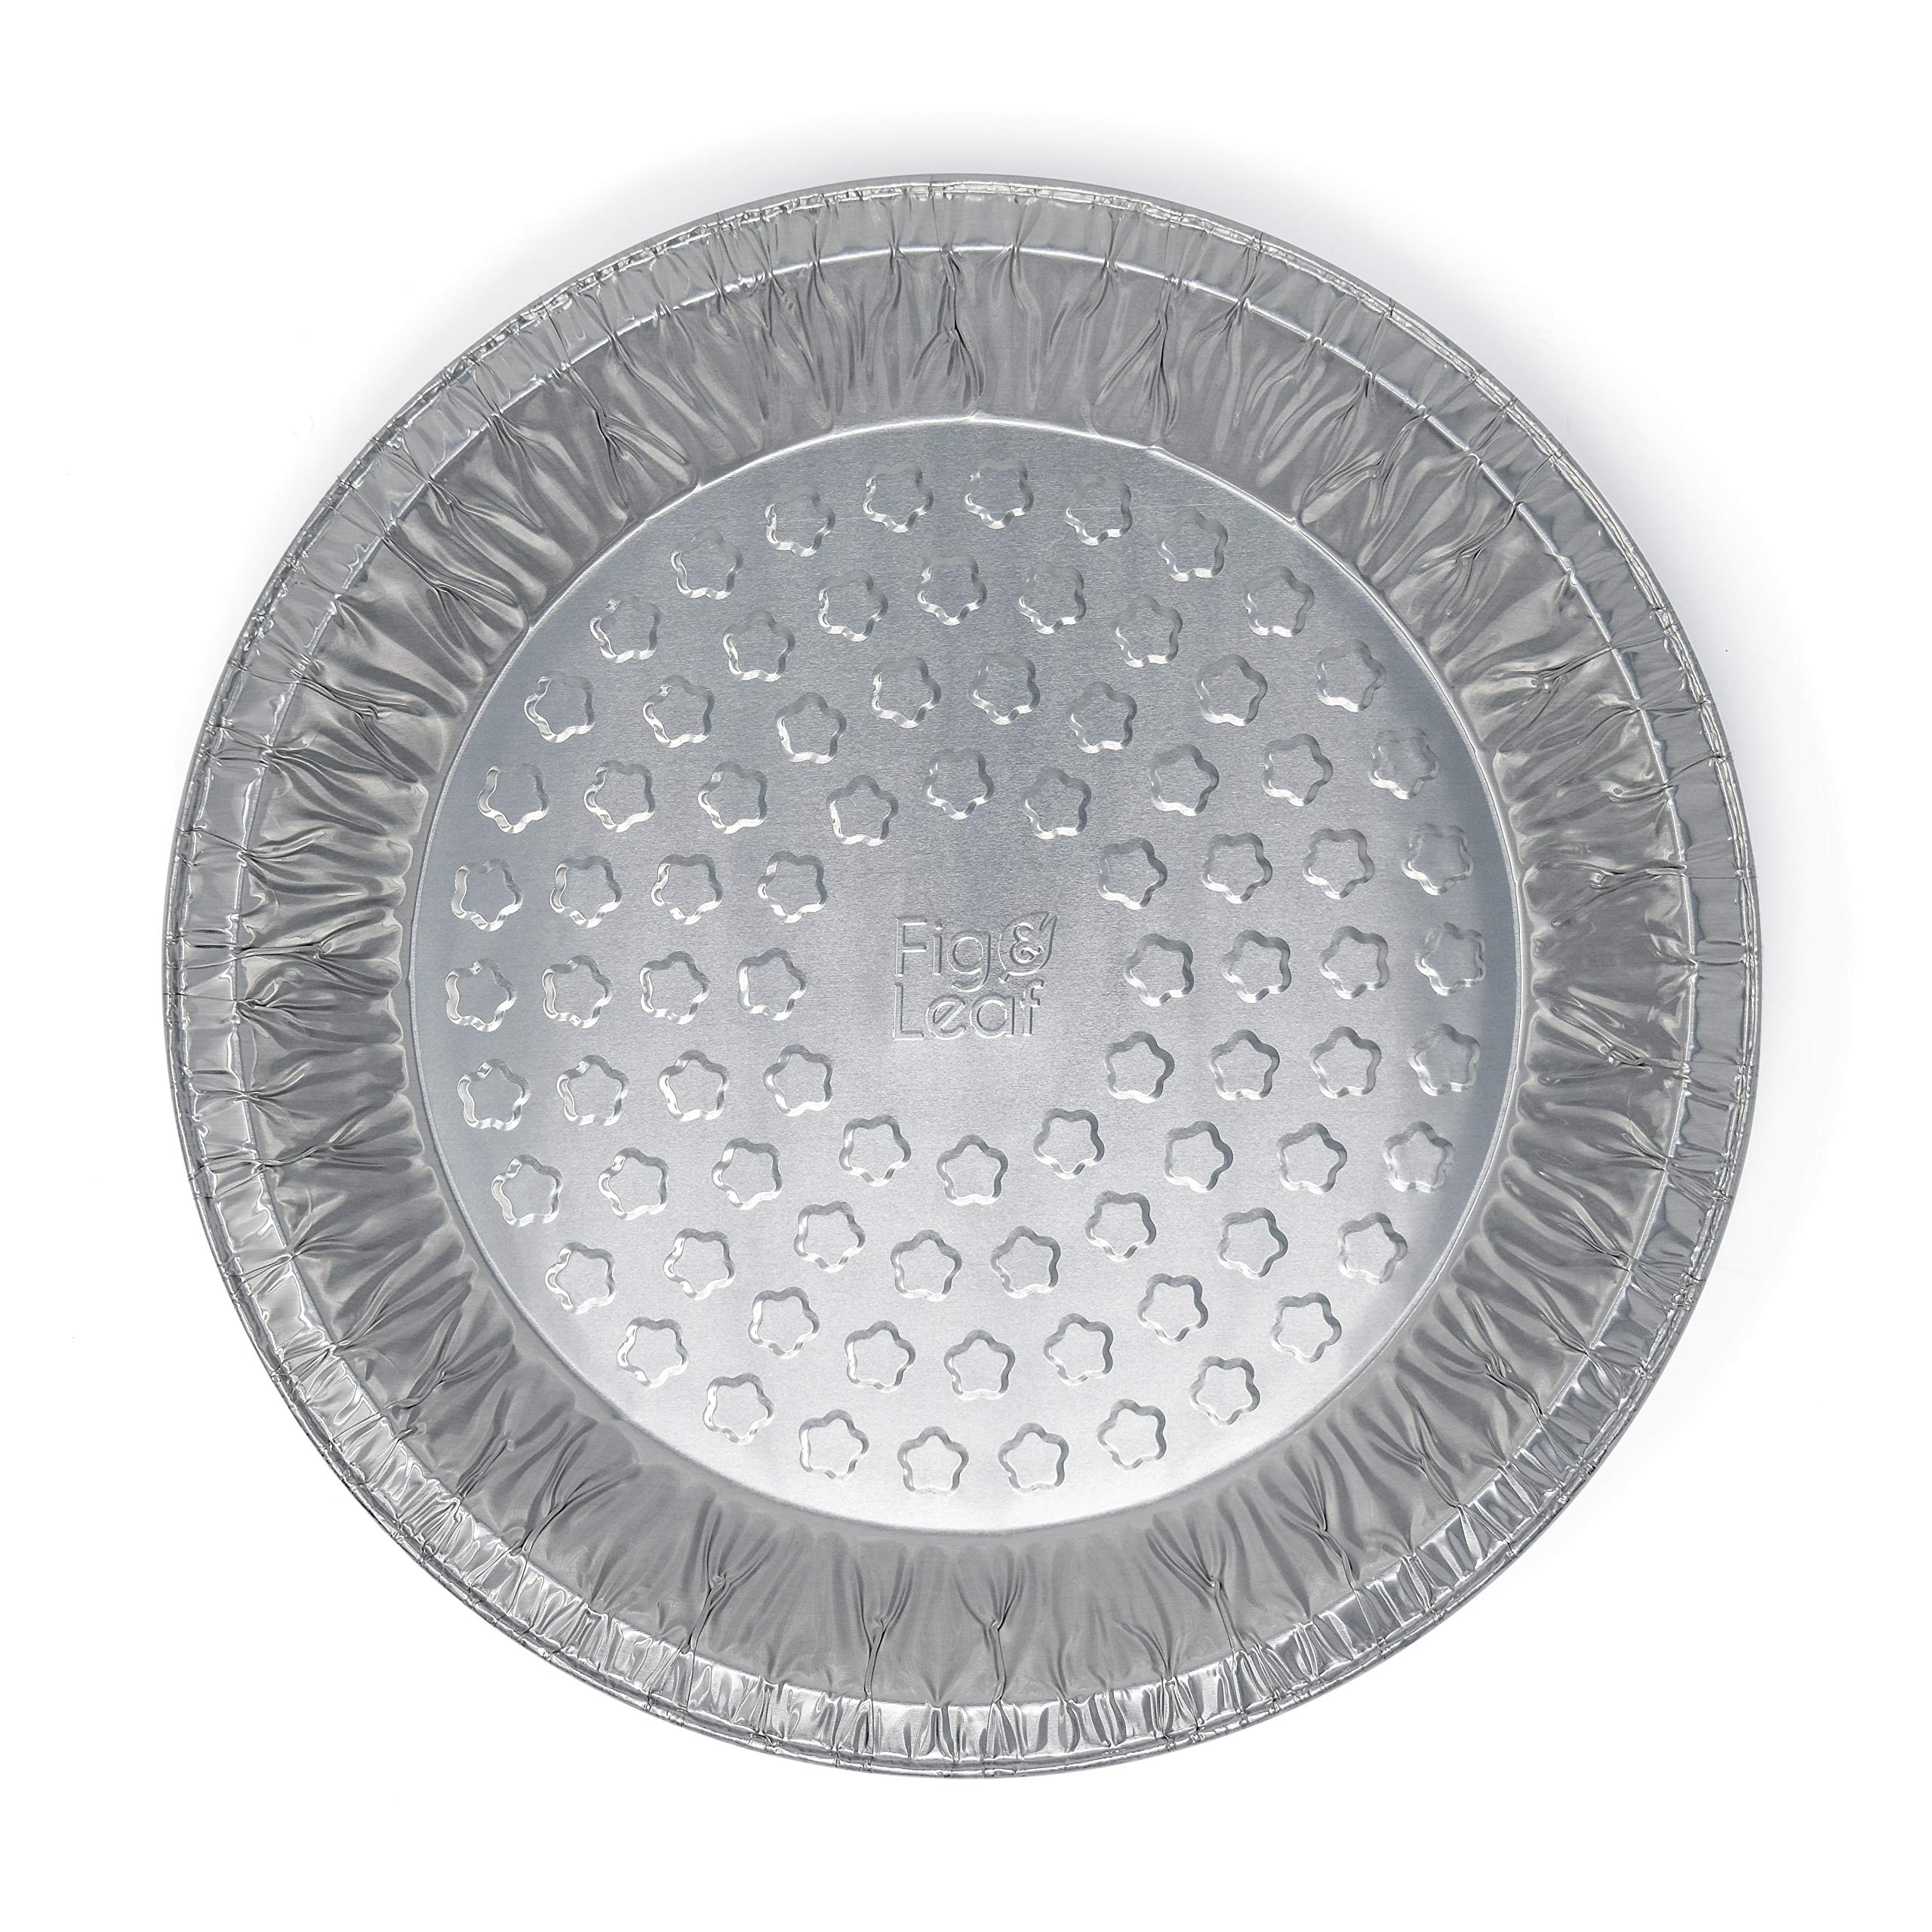 Fig & Leaf (120 Pack) Premium 9-Inch Pie Pans l 36 Gauge l Disposable Tart Pan Tin Plates Aluminum Foil for Baking Quiche by Fig & Leaf (Image #5)